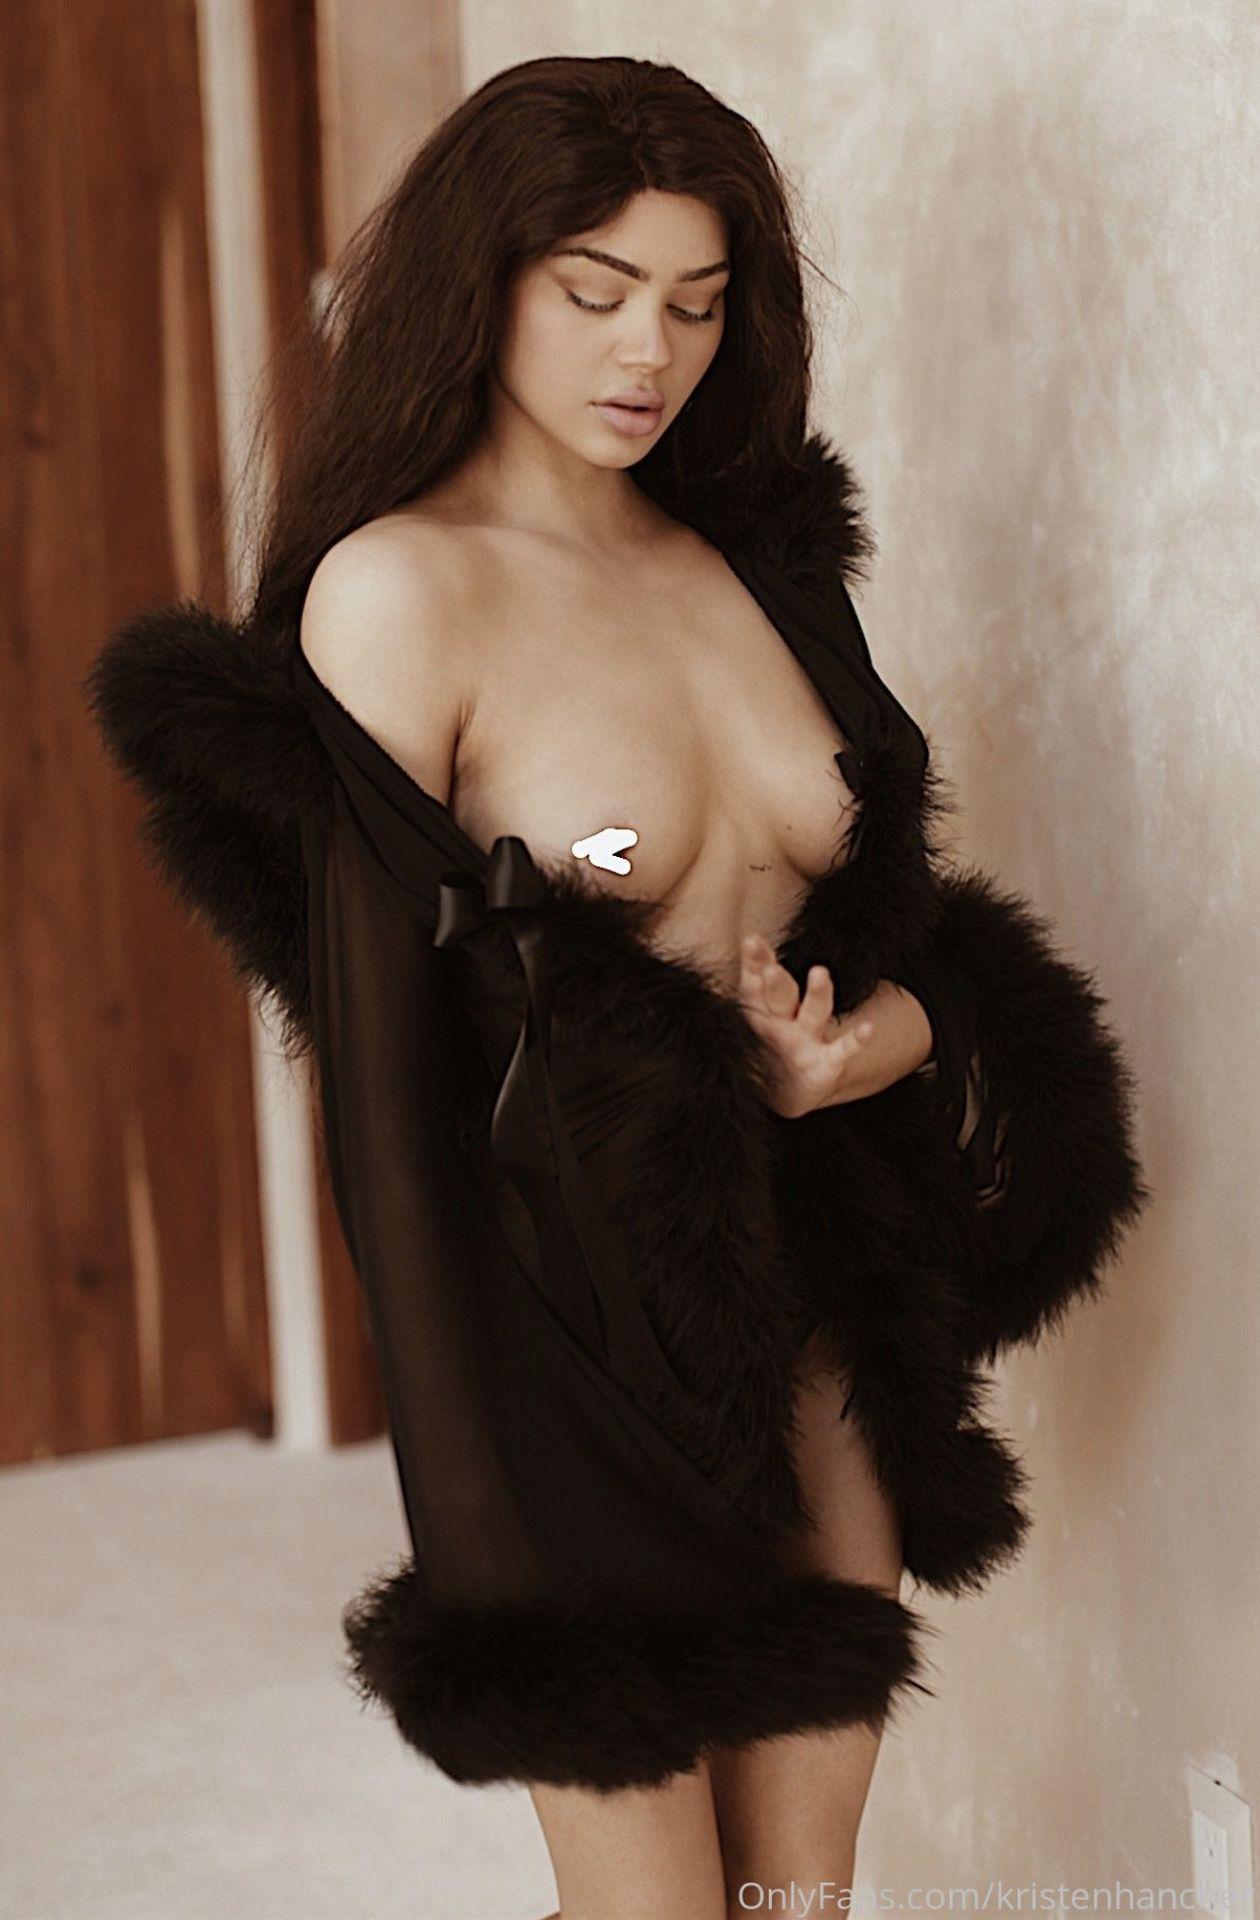 Kristen Hancher, Onlyfans Nudes Leaks 0041